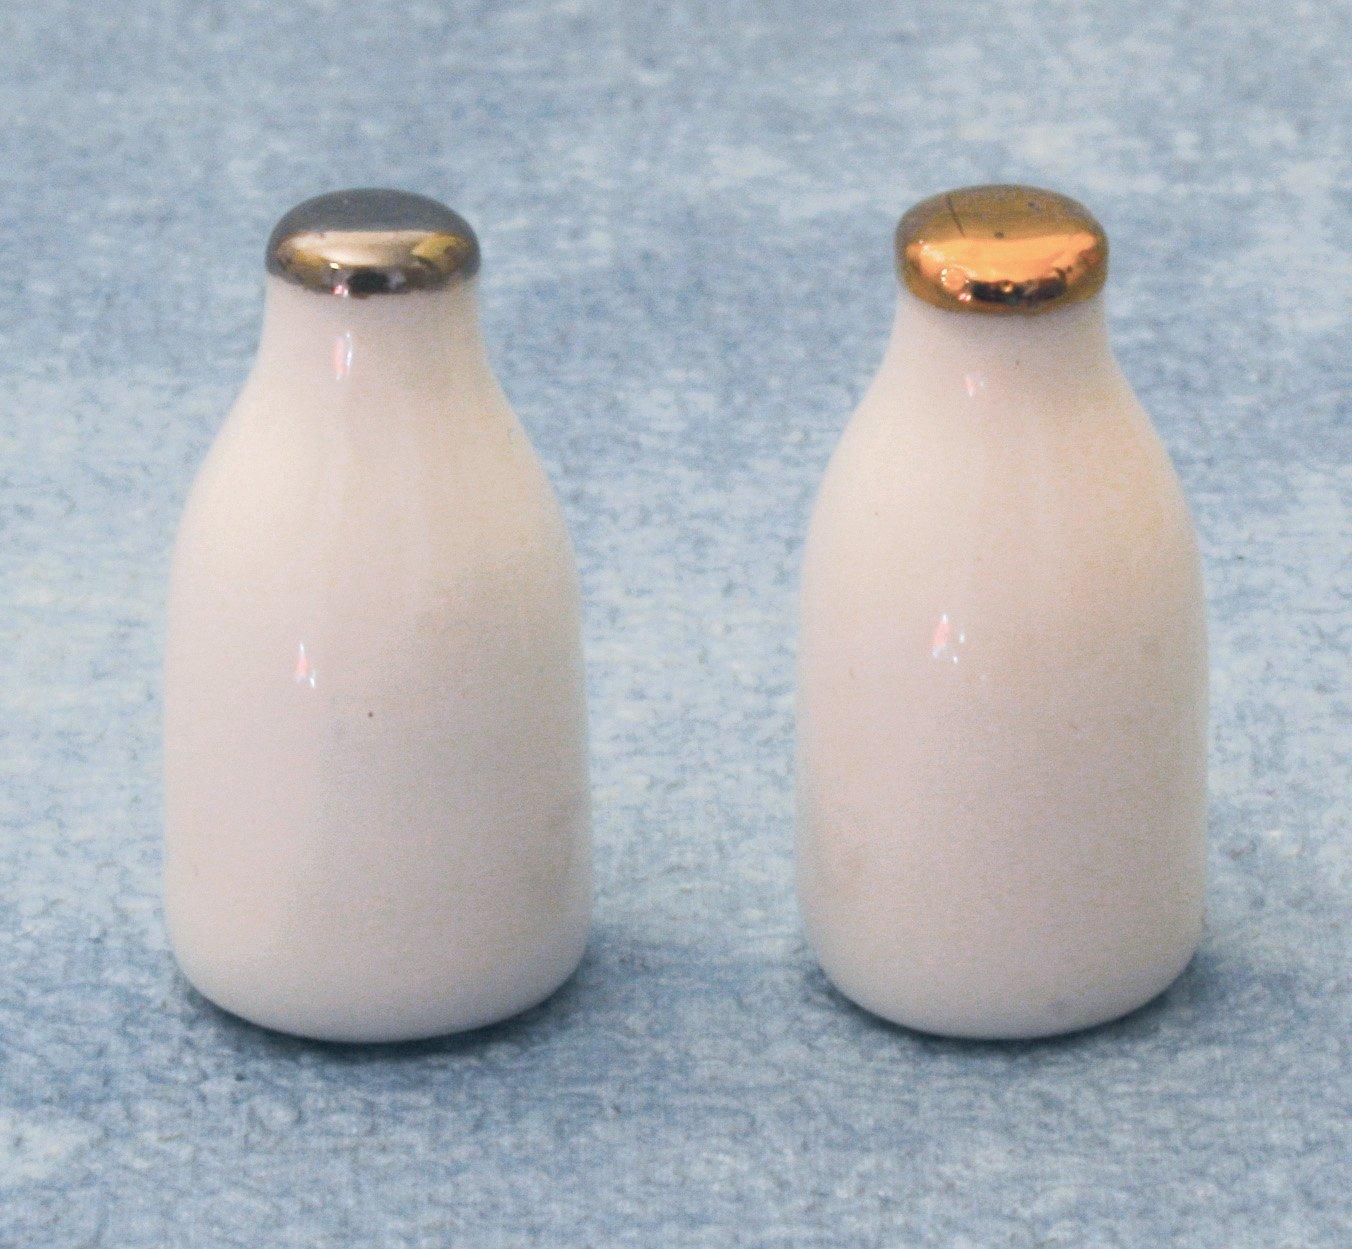 Dolls House Milk Bottles x 2 Miniatures 1/12th Scale   B01D1PW1XY